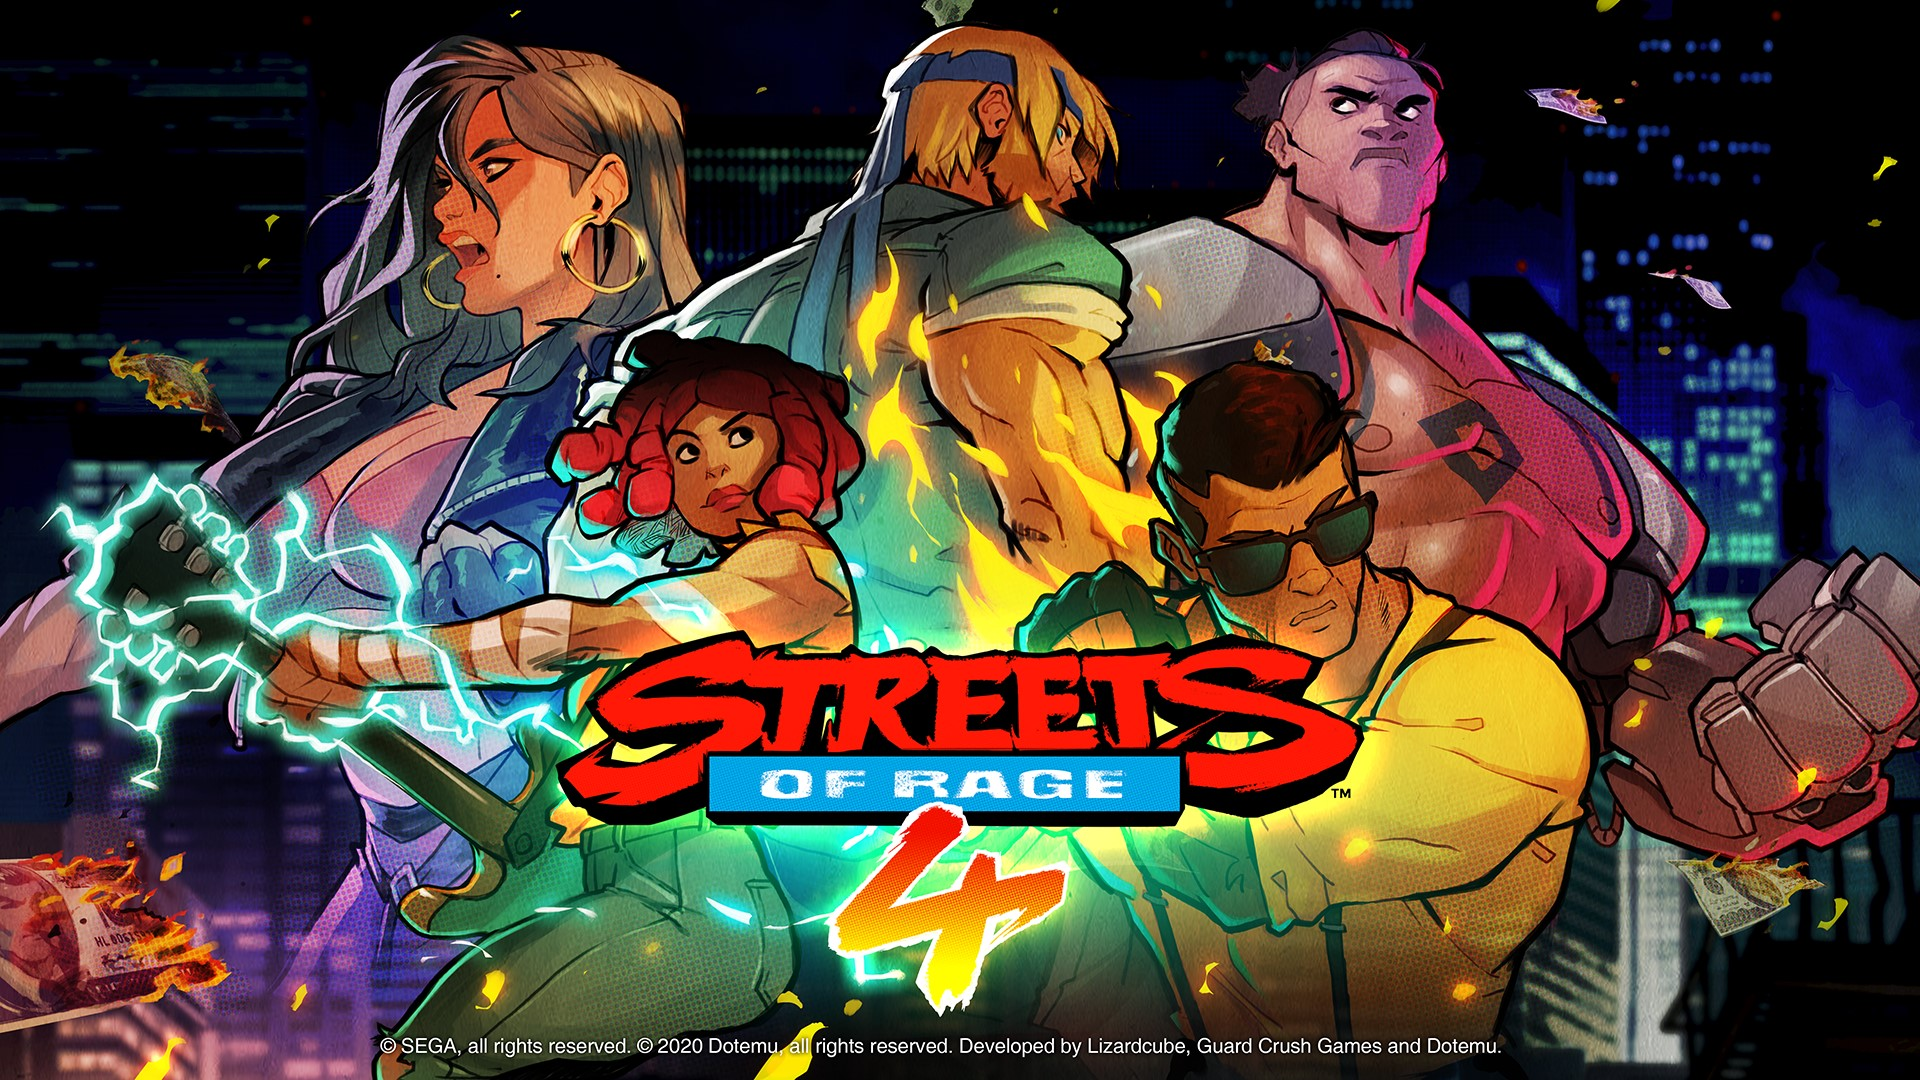 streets-of-rage-4-key-art.jpg